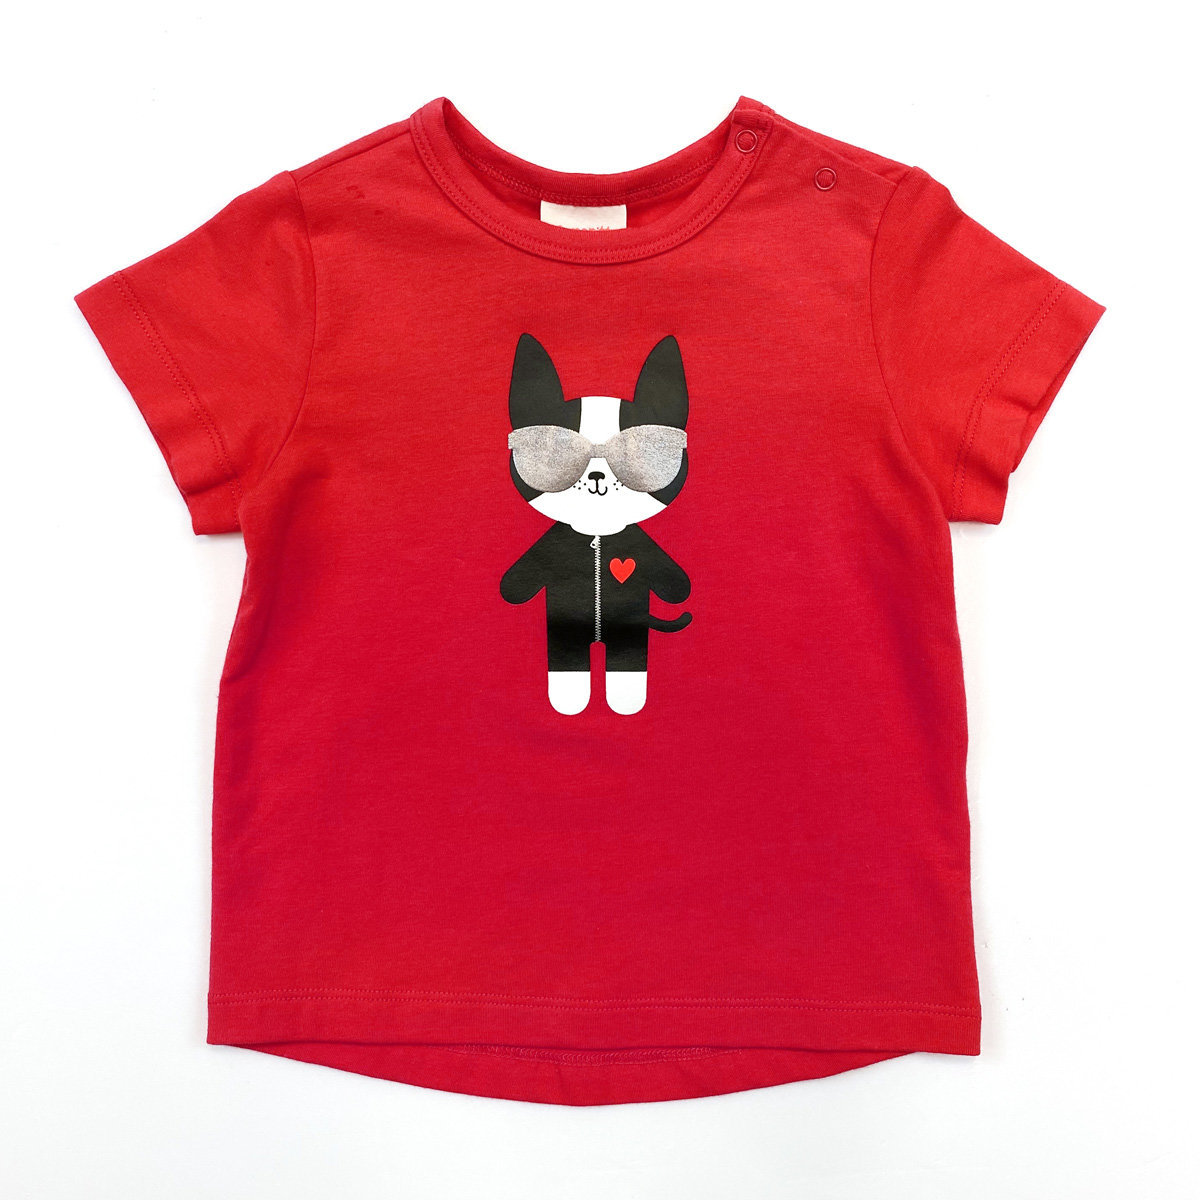 T-shirt with Dog Print